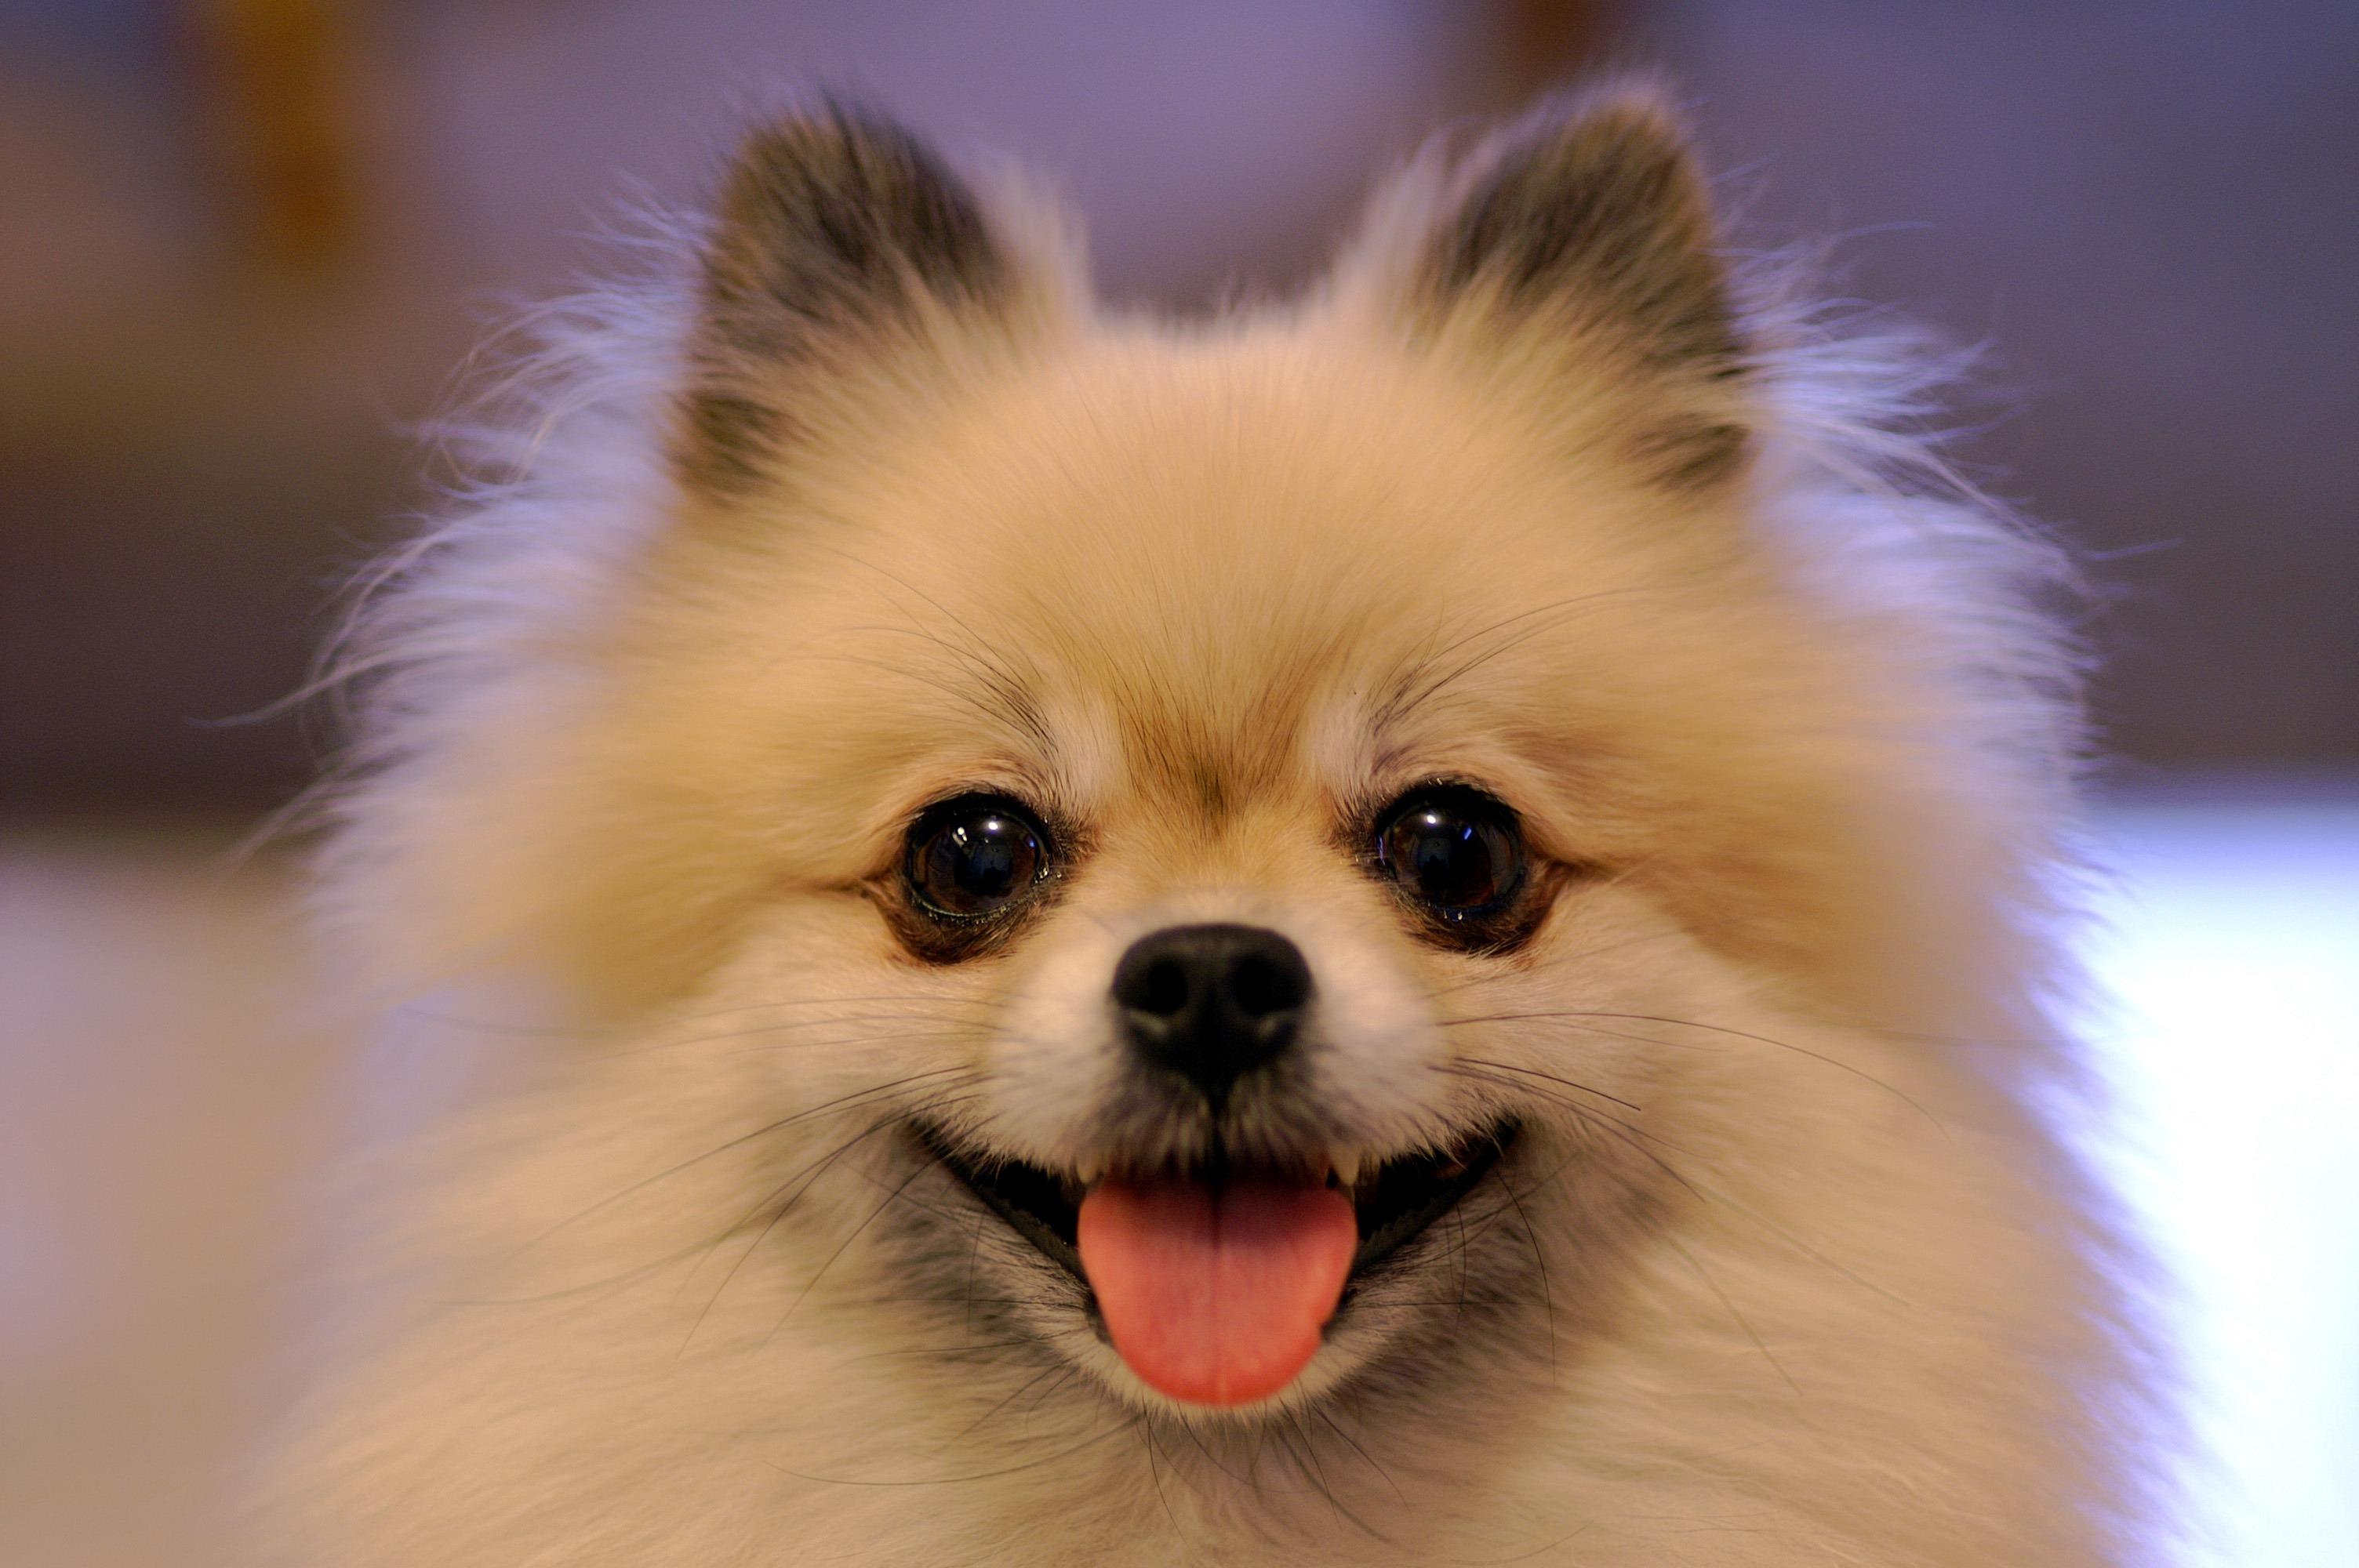 Smiling_Tan_Pomeranian.jpg